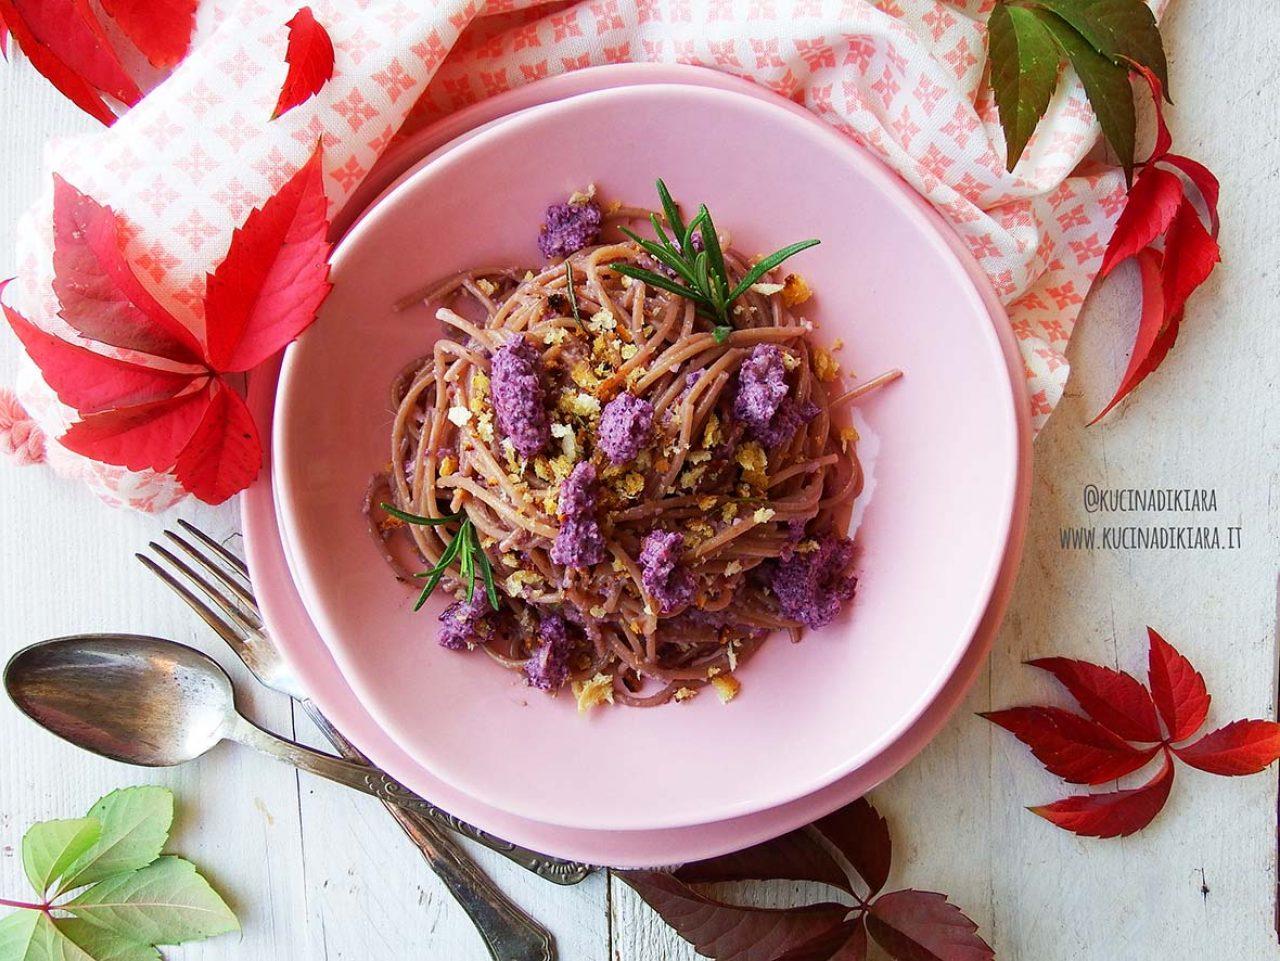 Kk3 Spaghetti Integr Pesto Cavolo Rosso Psd